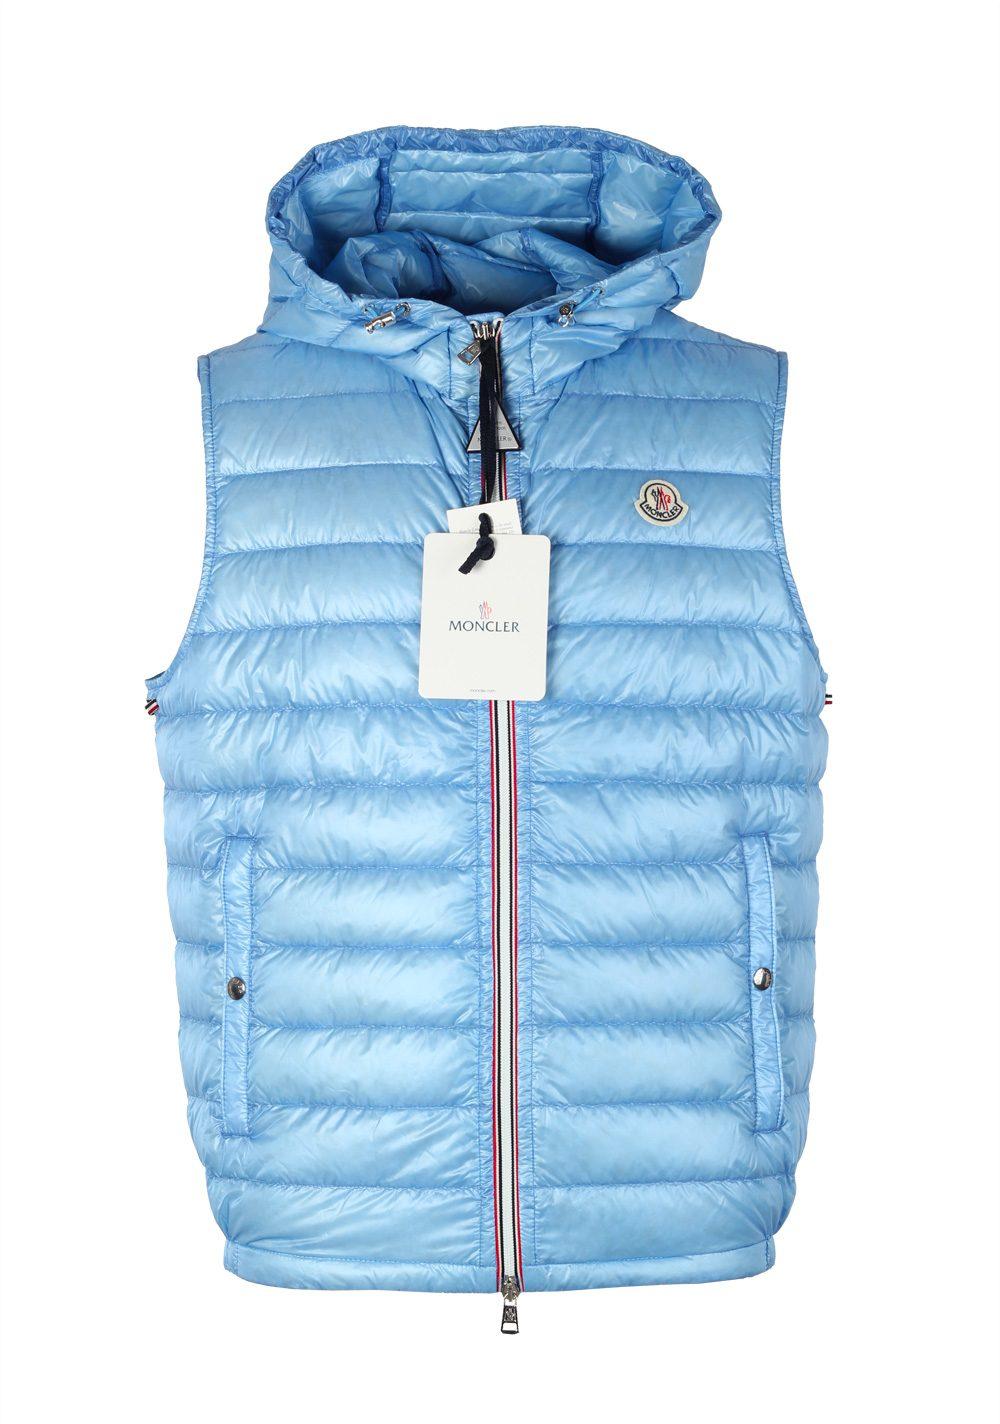 Moncler Blue Gien Hooded Shell Gilet Vest Size 4 / L / 52 / 42 U.S. | Costume Limité